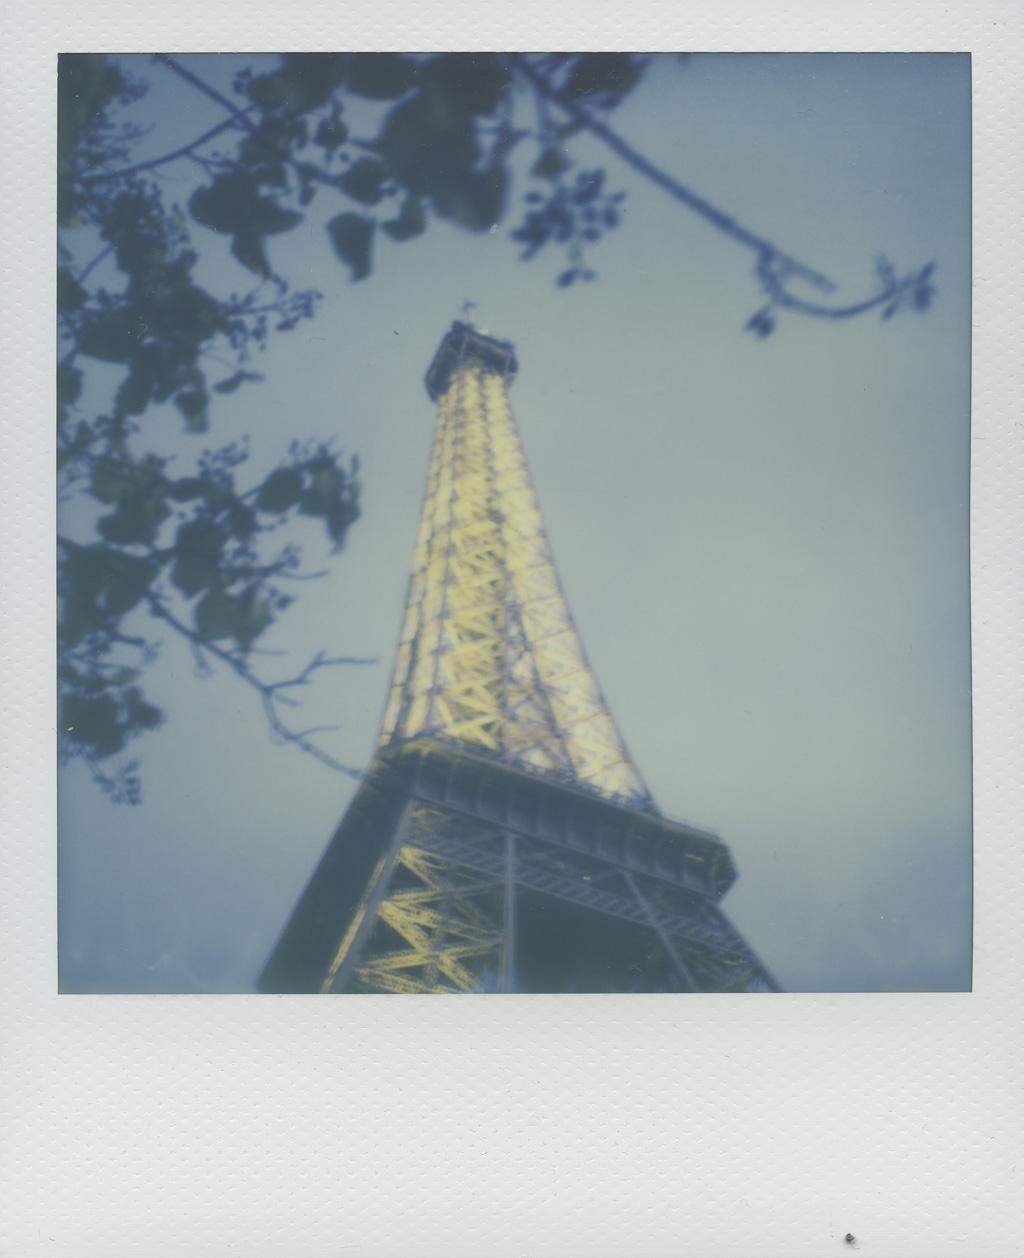 Paris tour eiffel003.jpg